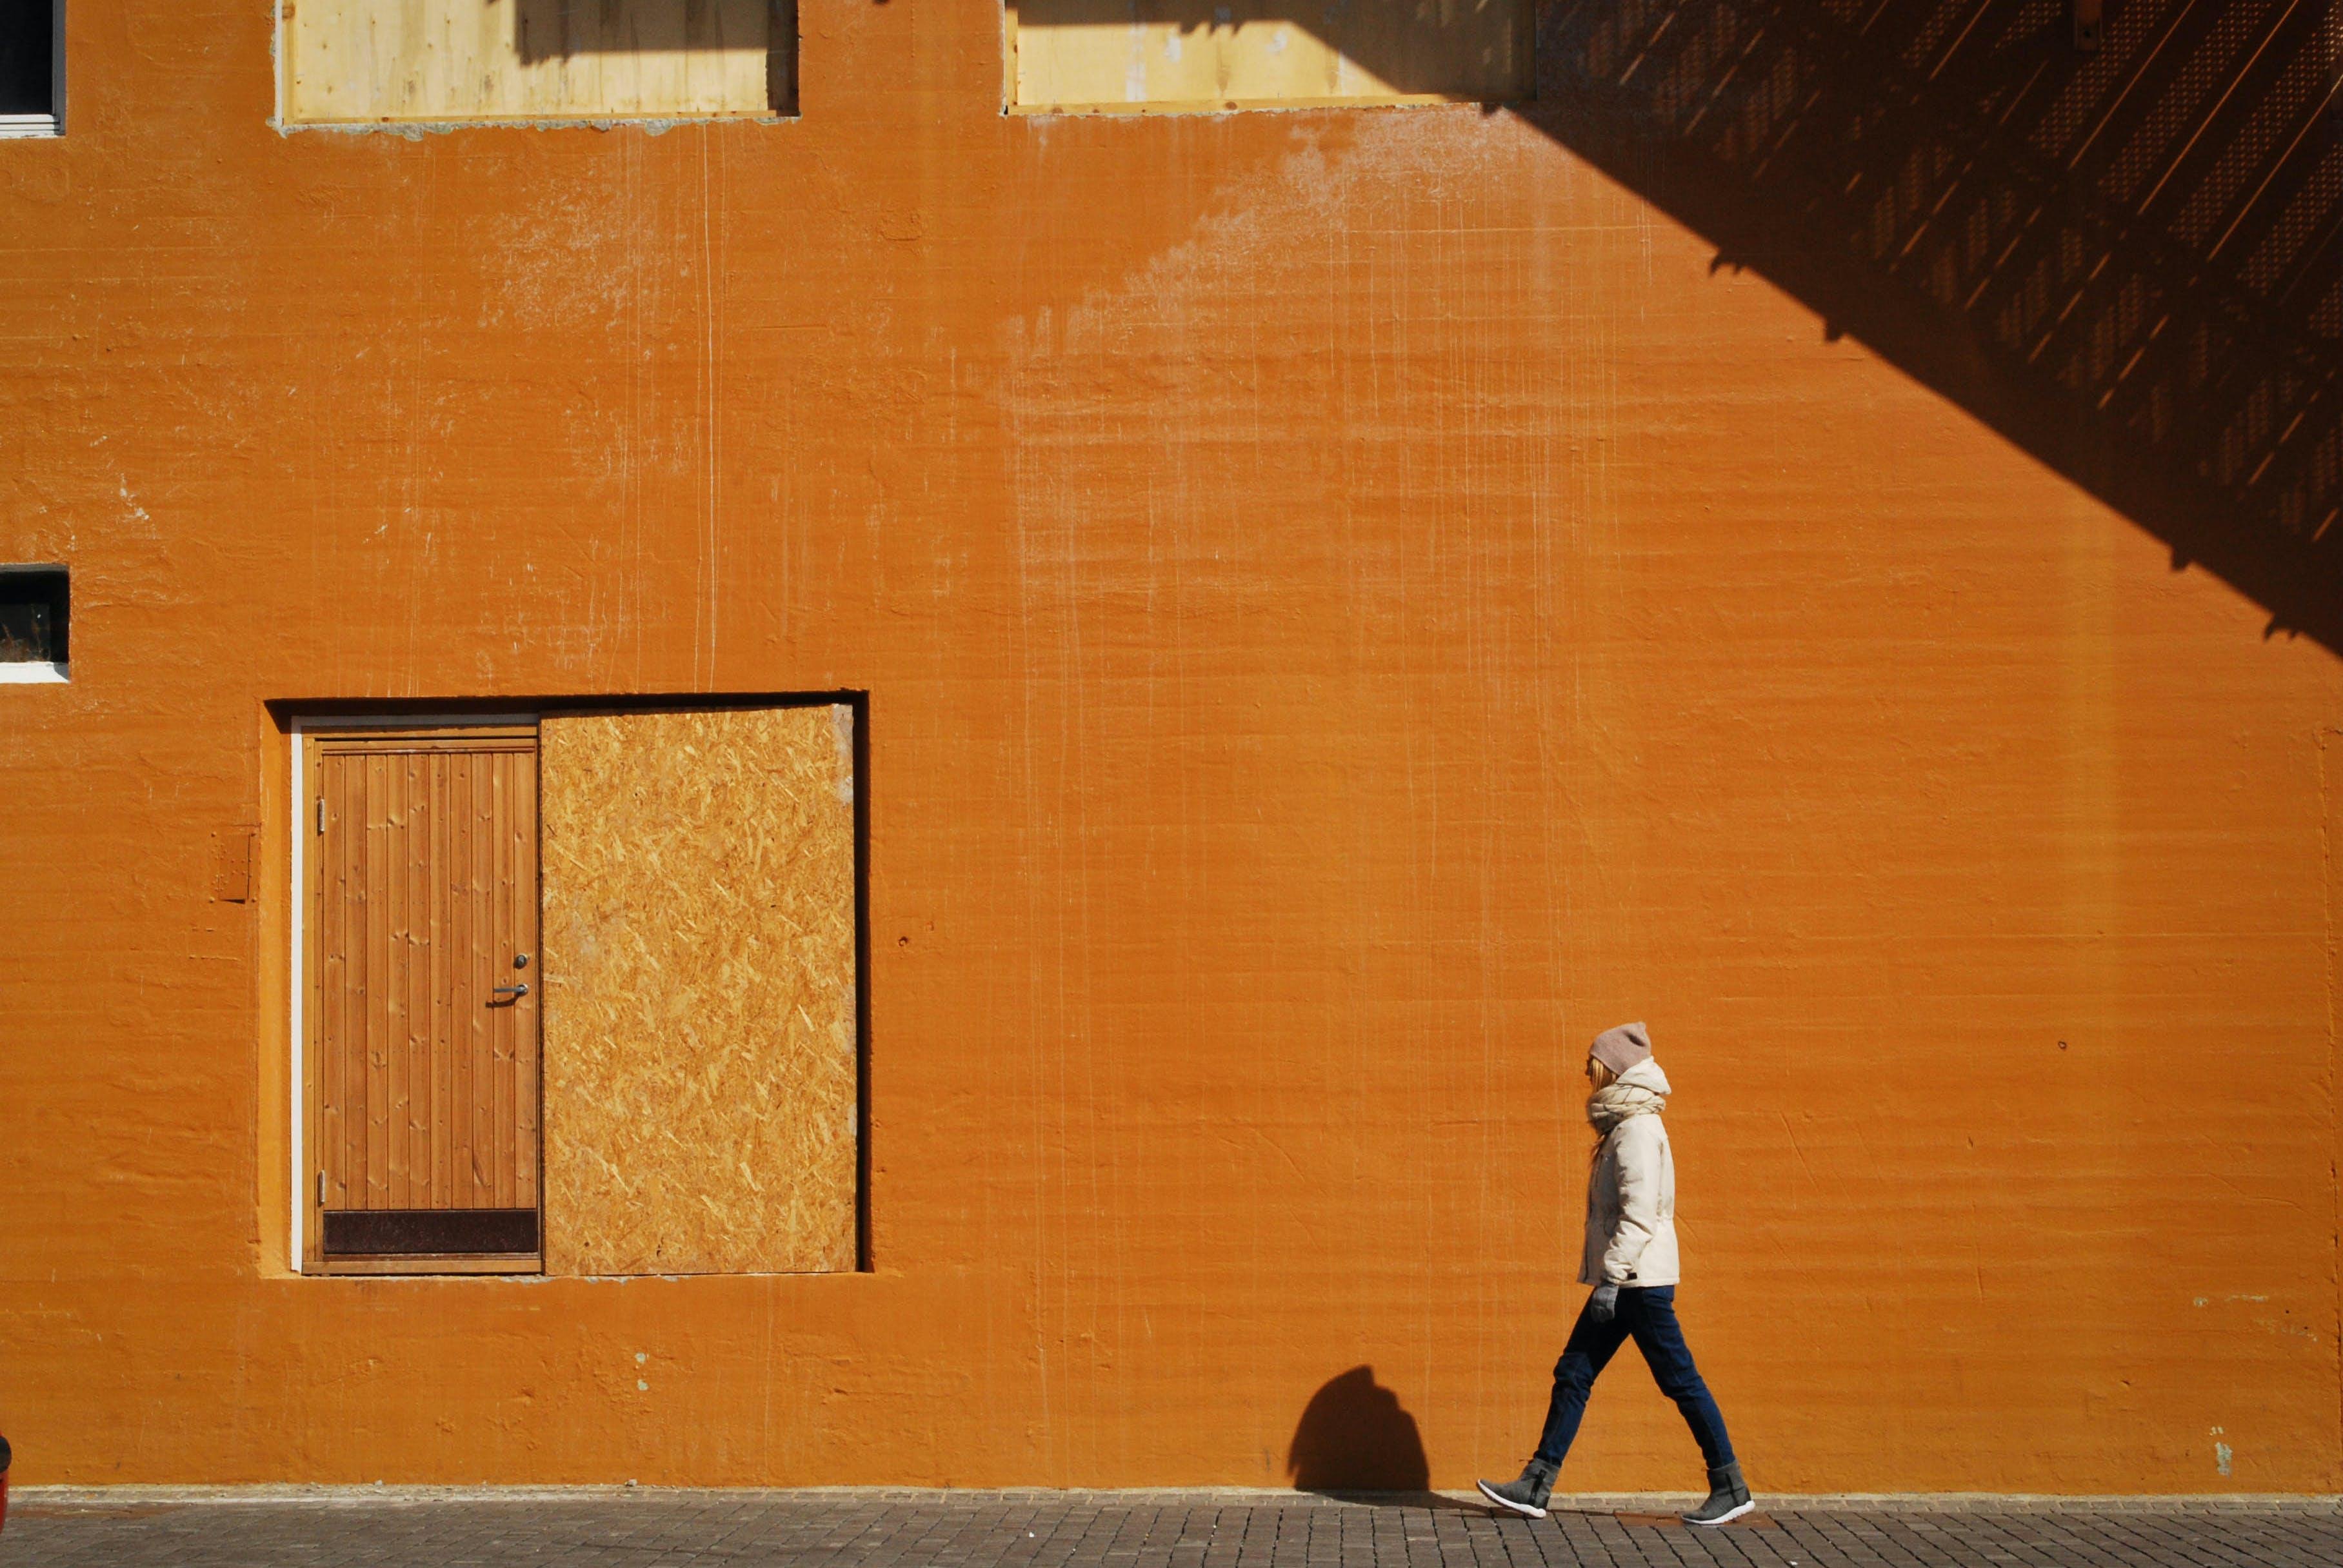 Person Walking on Sidewalk